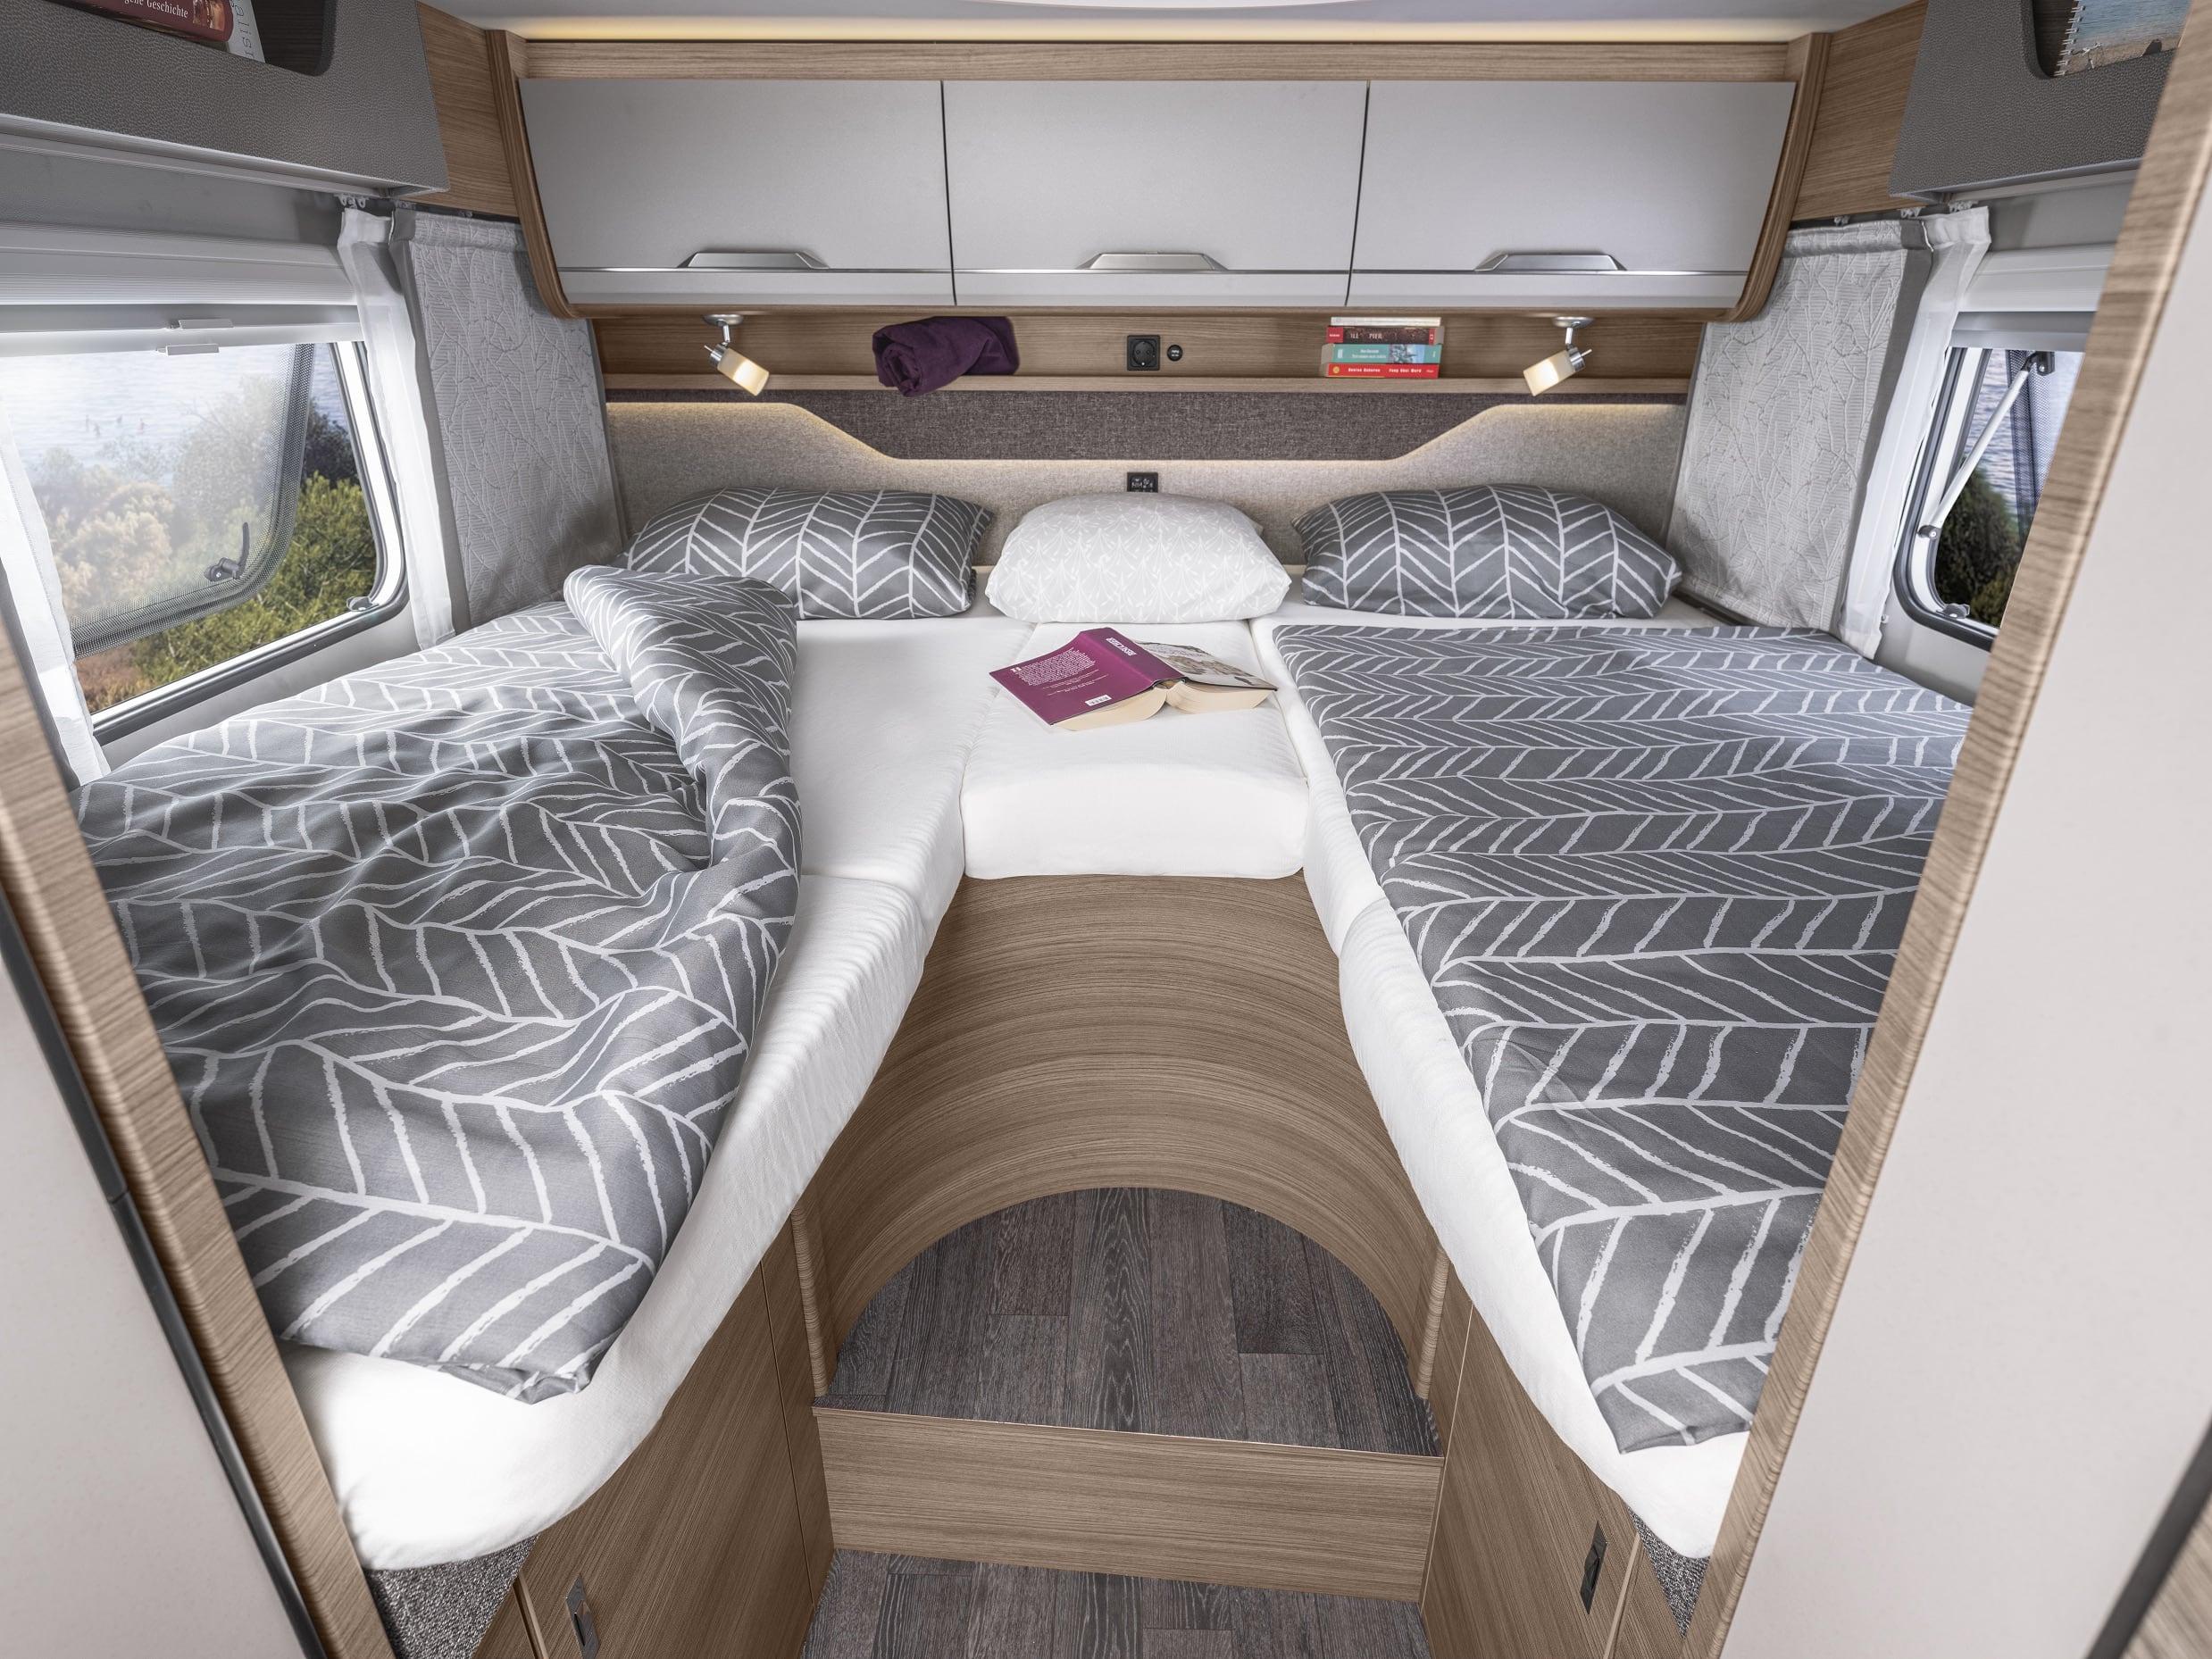 Extra lange Betten im VAN TI 2021 - Knaus Tabbert Gruppe